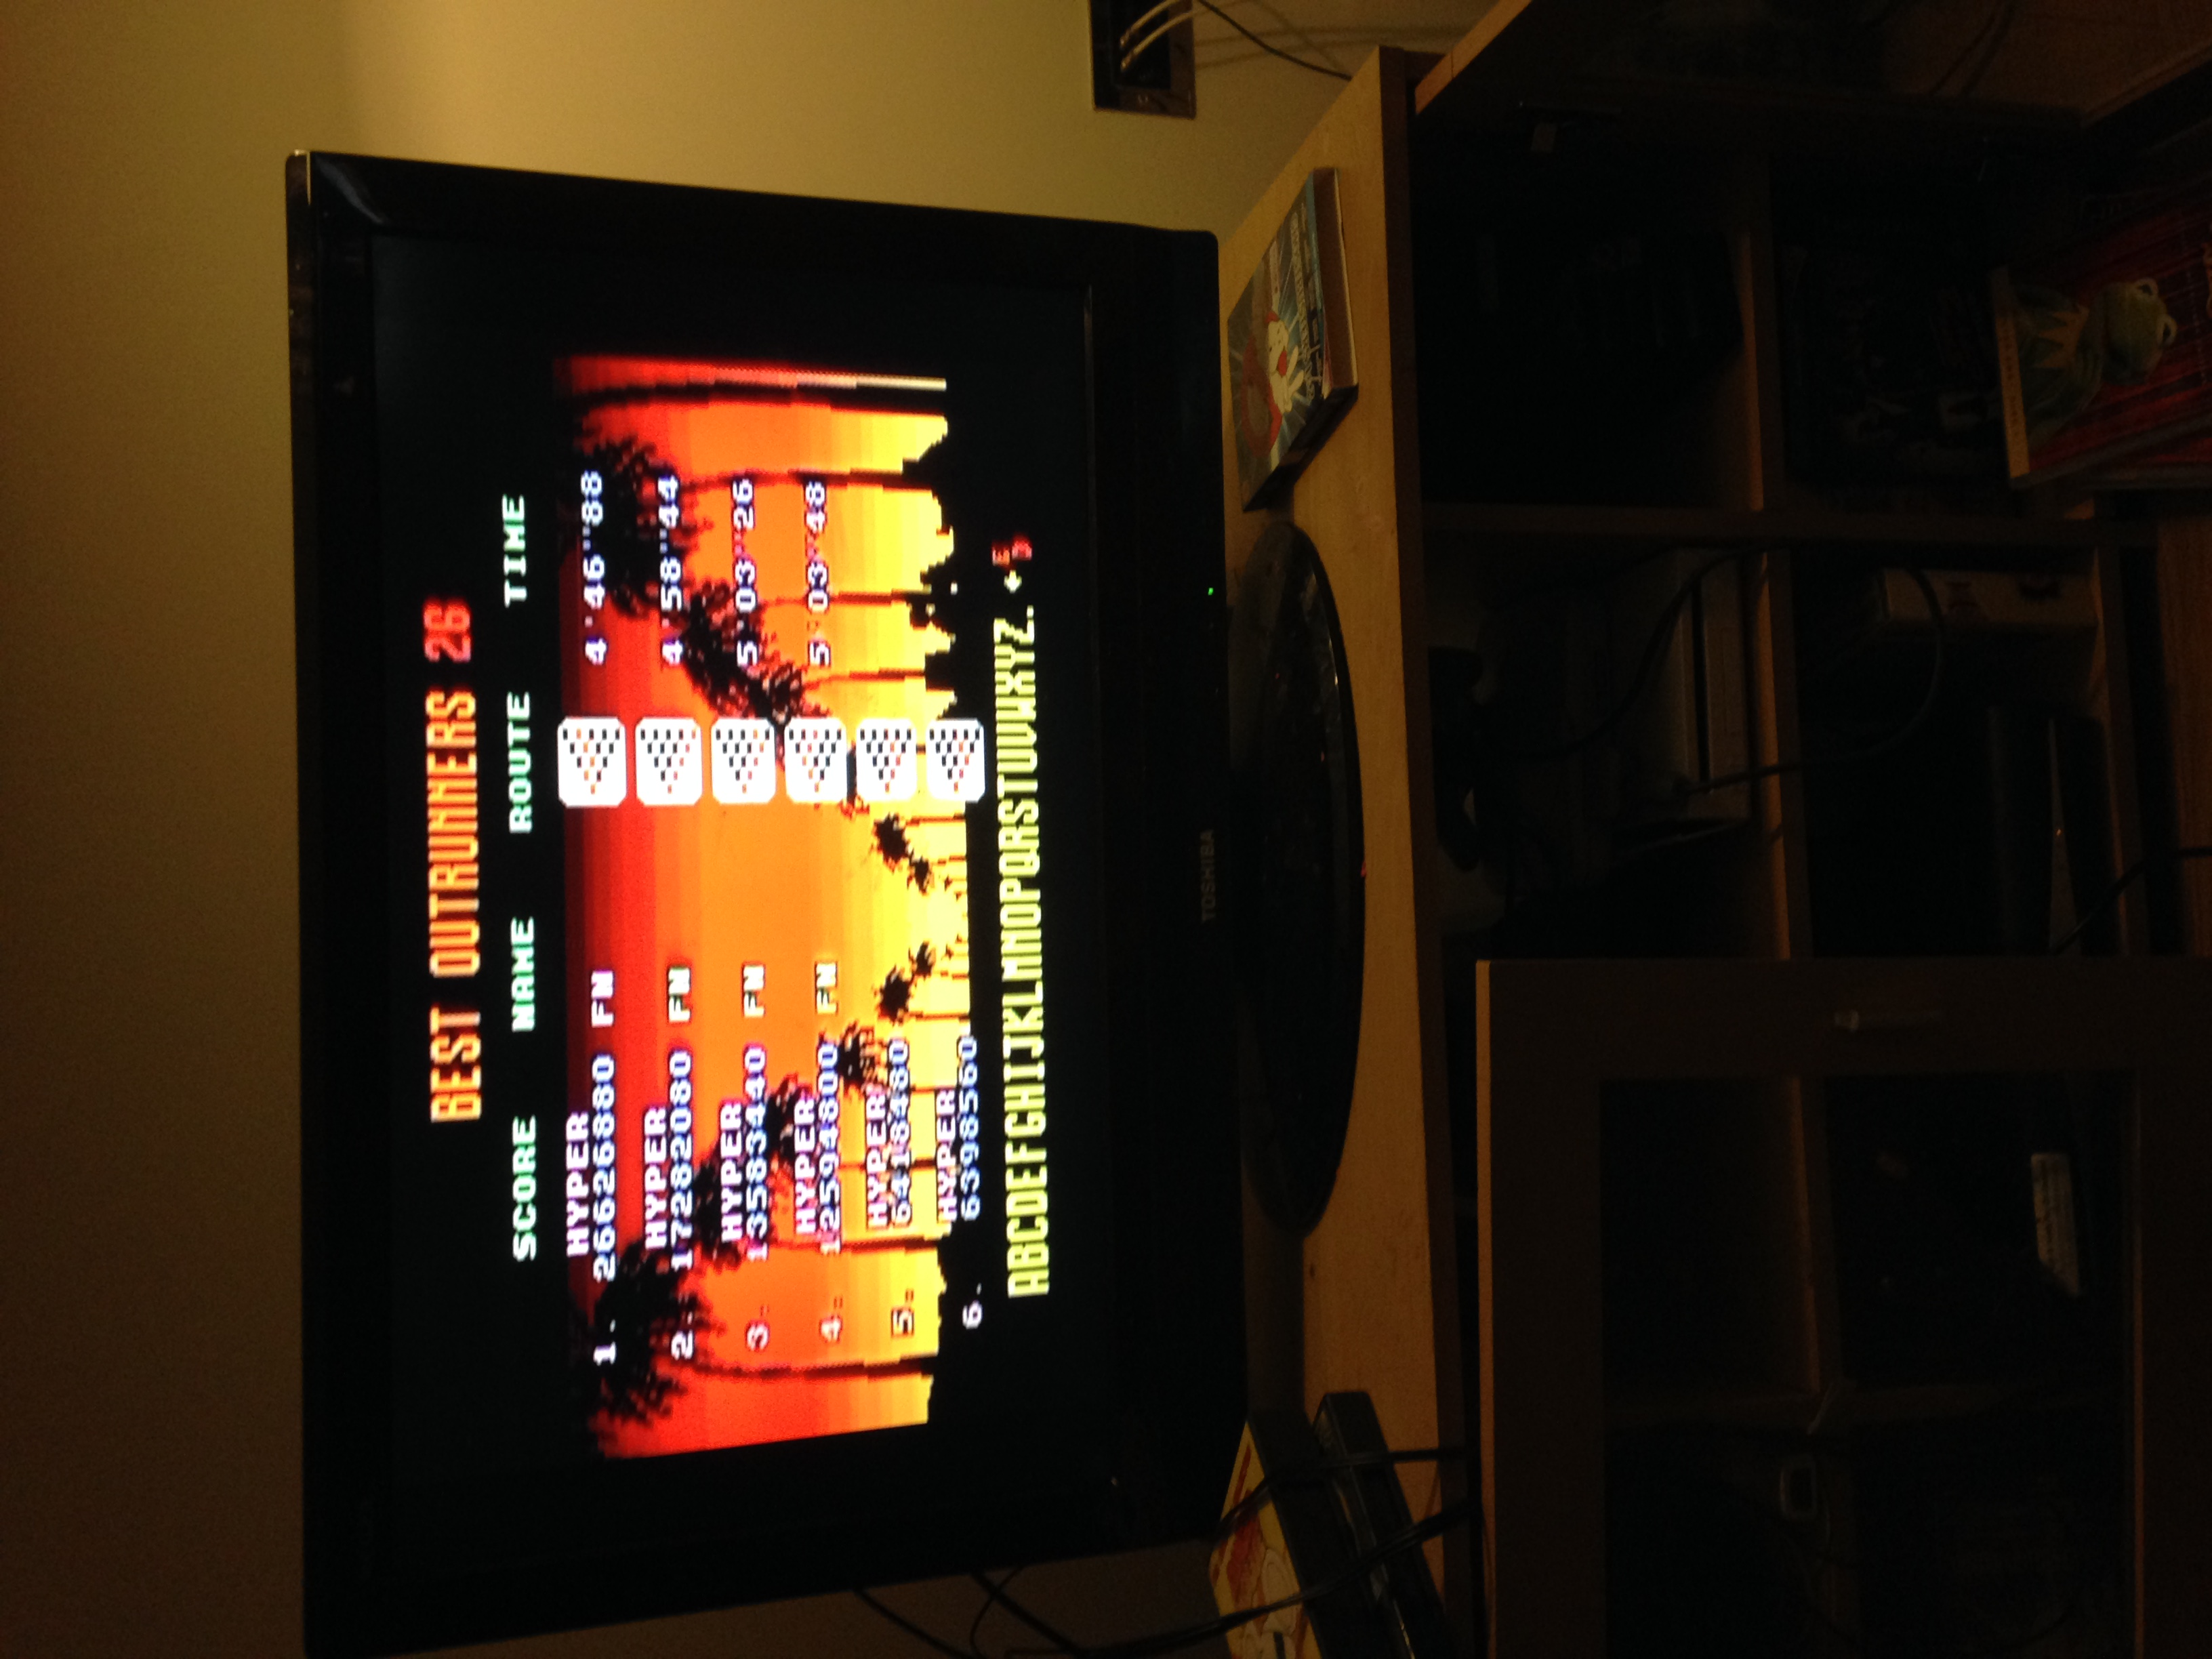 mechafatnick: Outrun [Hyper] Goal E (Sega Genesis / MegaDrive) 17,282,080 points on 2015-03-07 02:36:26